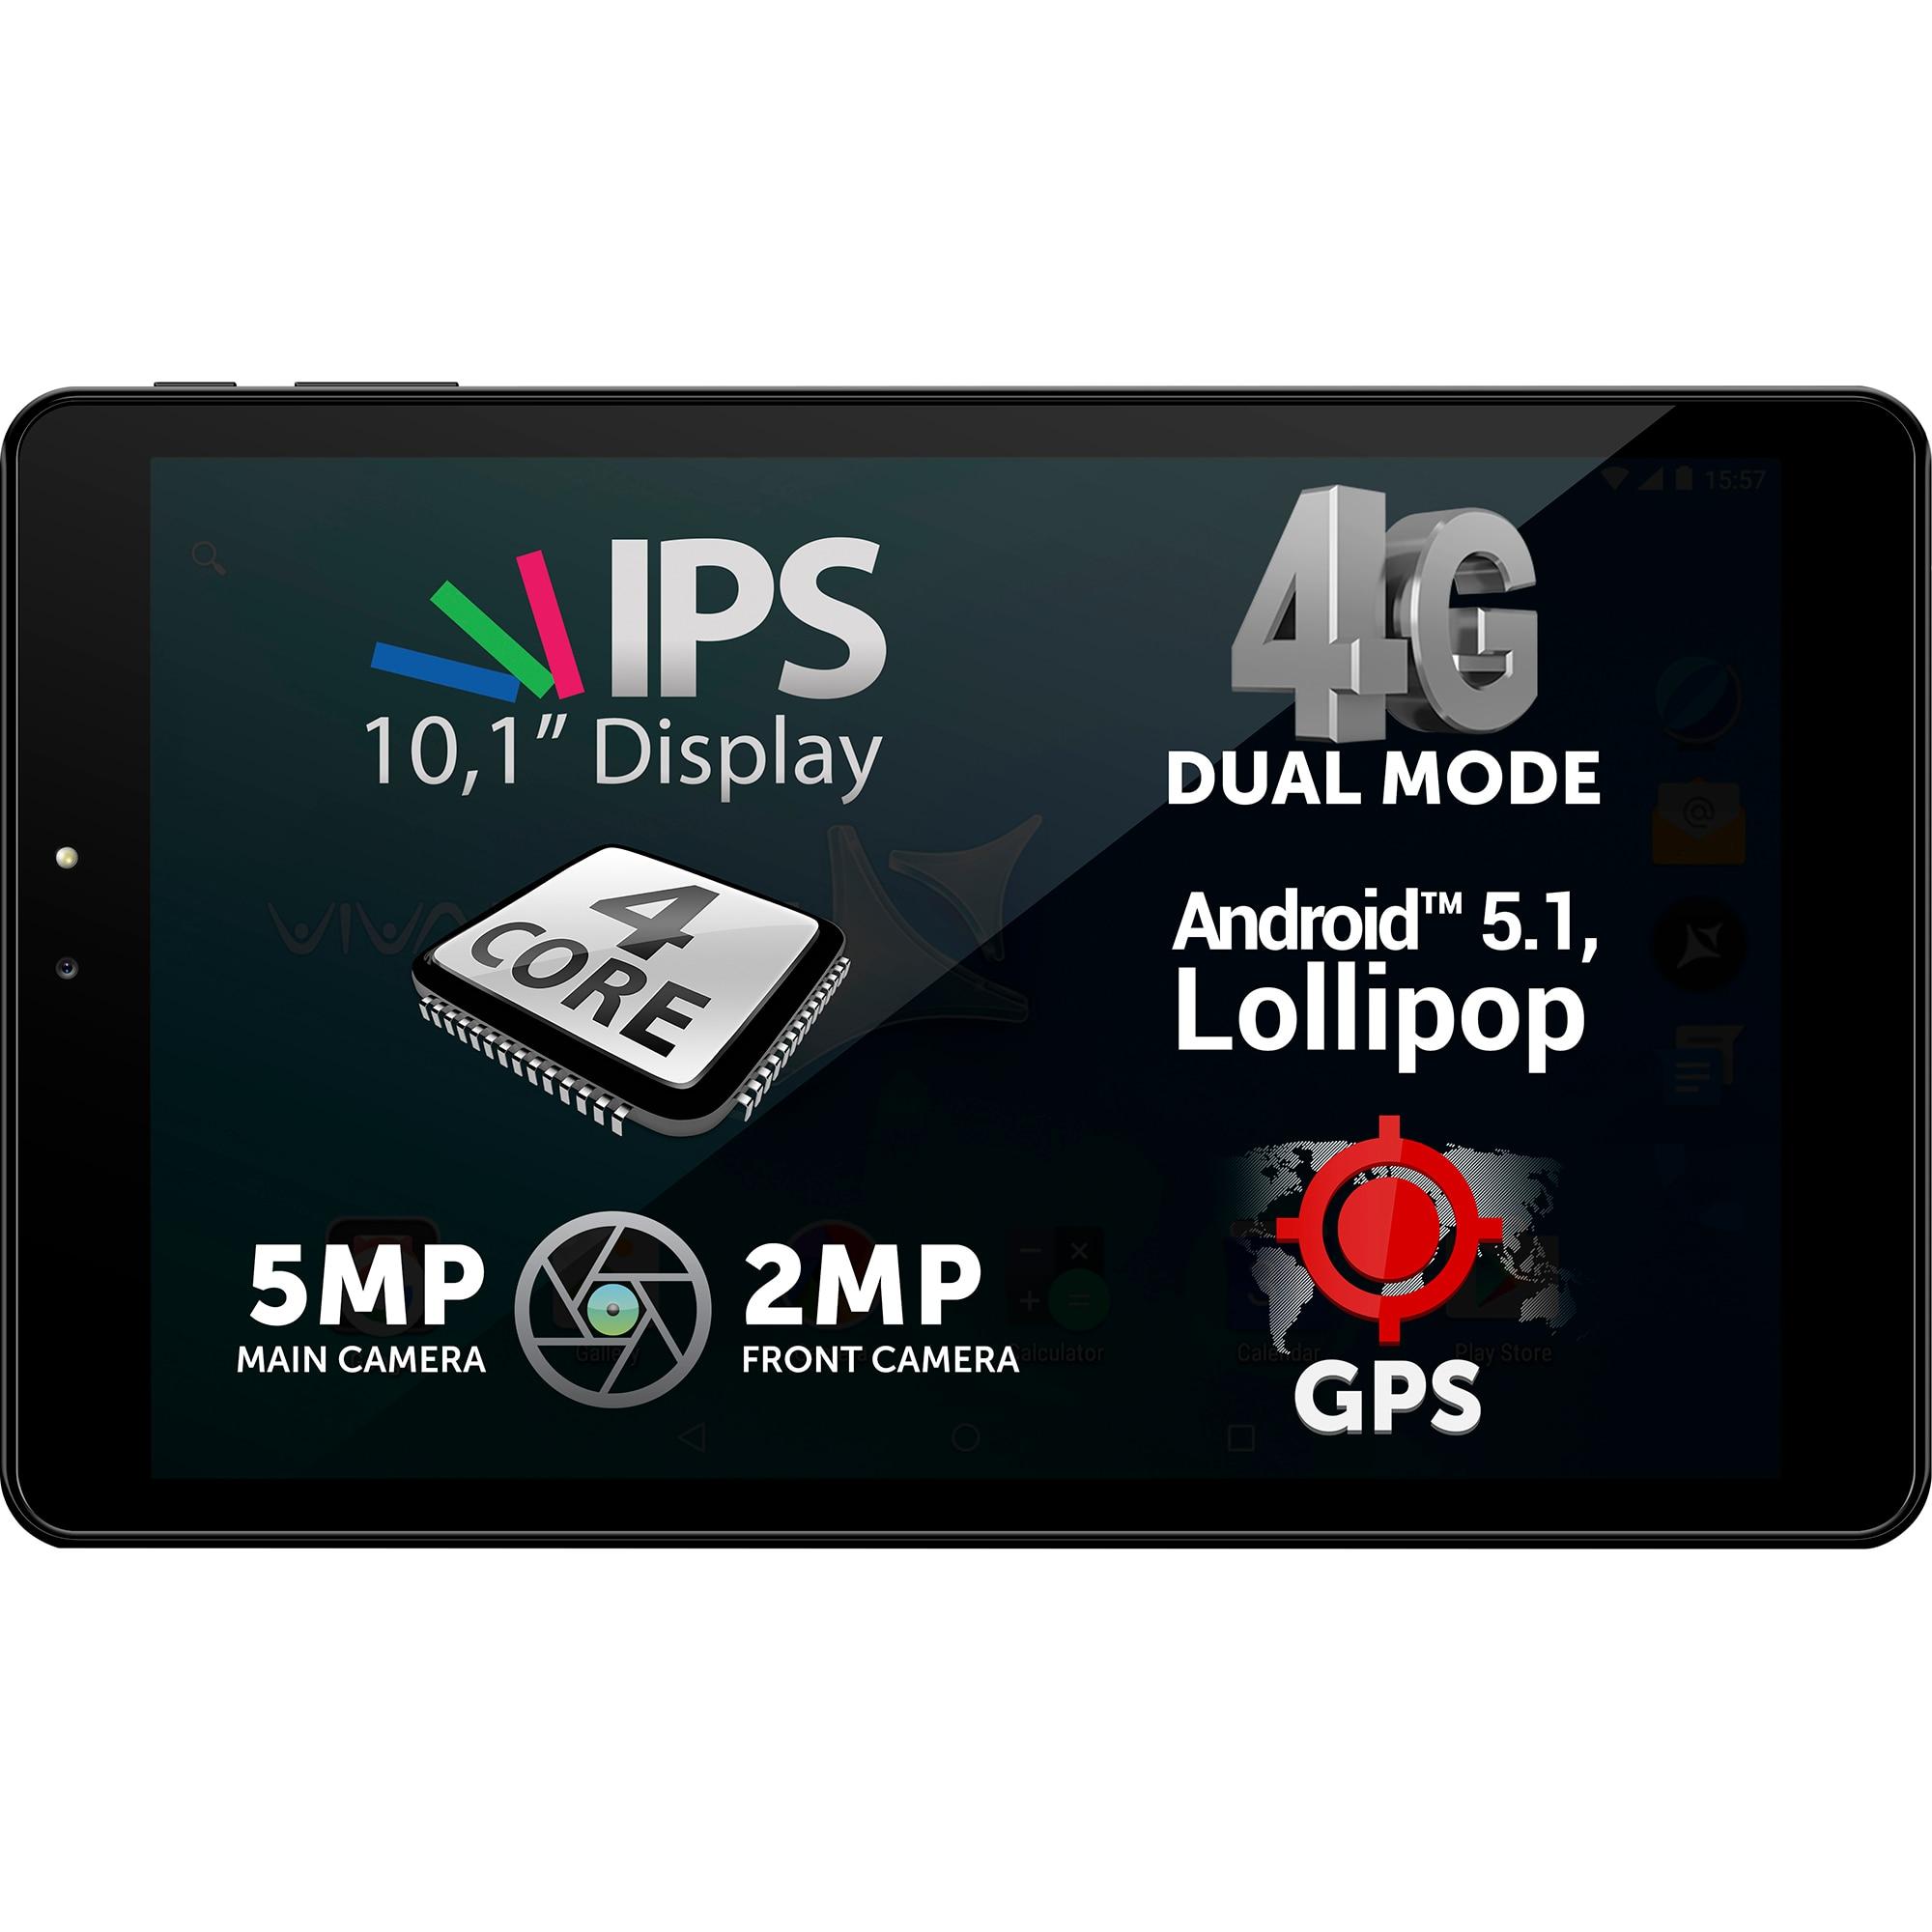 "Fotografie Tableta Allview Viva H1001, 10.1"", Quad Core 1Ghz, 1GB RAM, 8GB, 4G, IPS, Black"